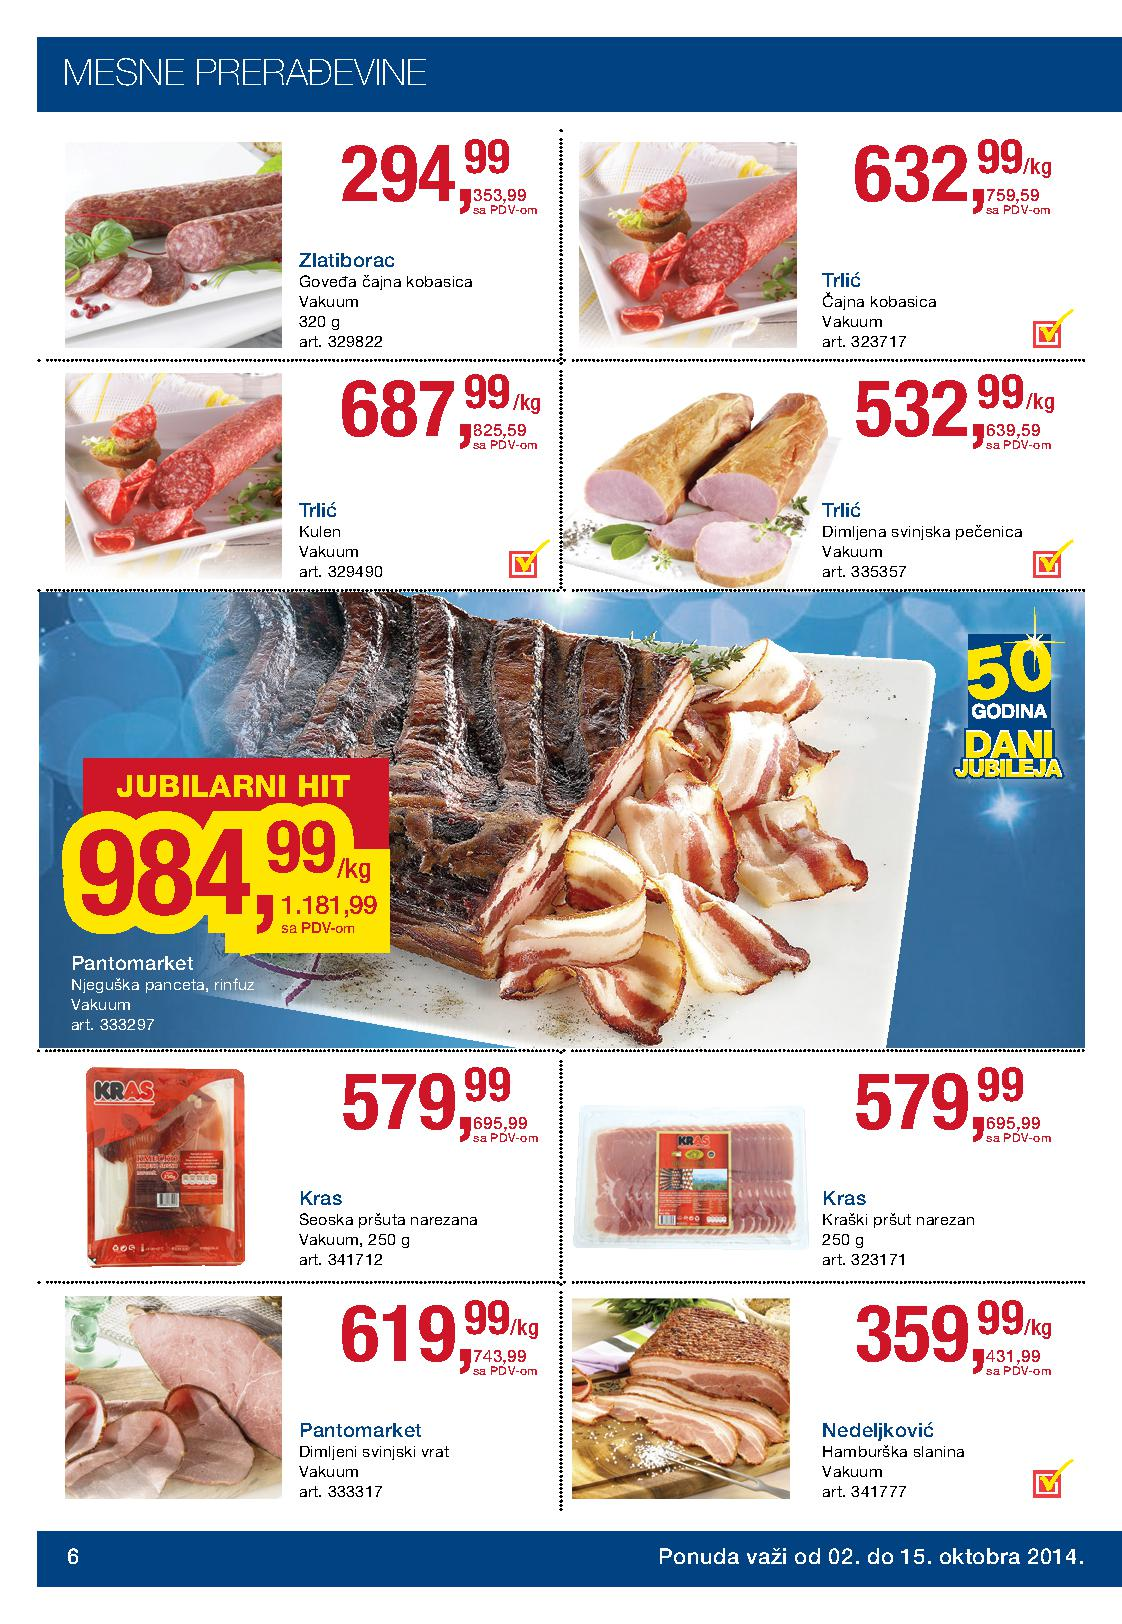 Metro prehrana akcija super cena